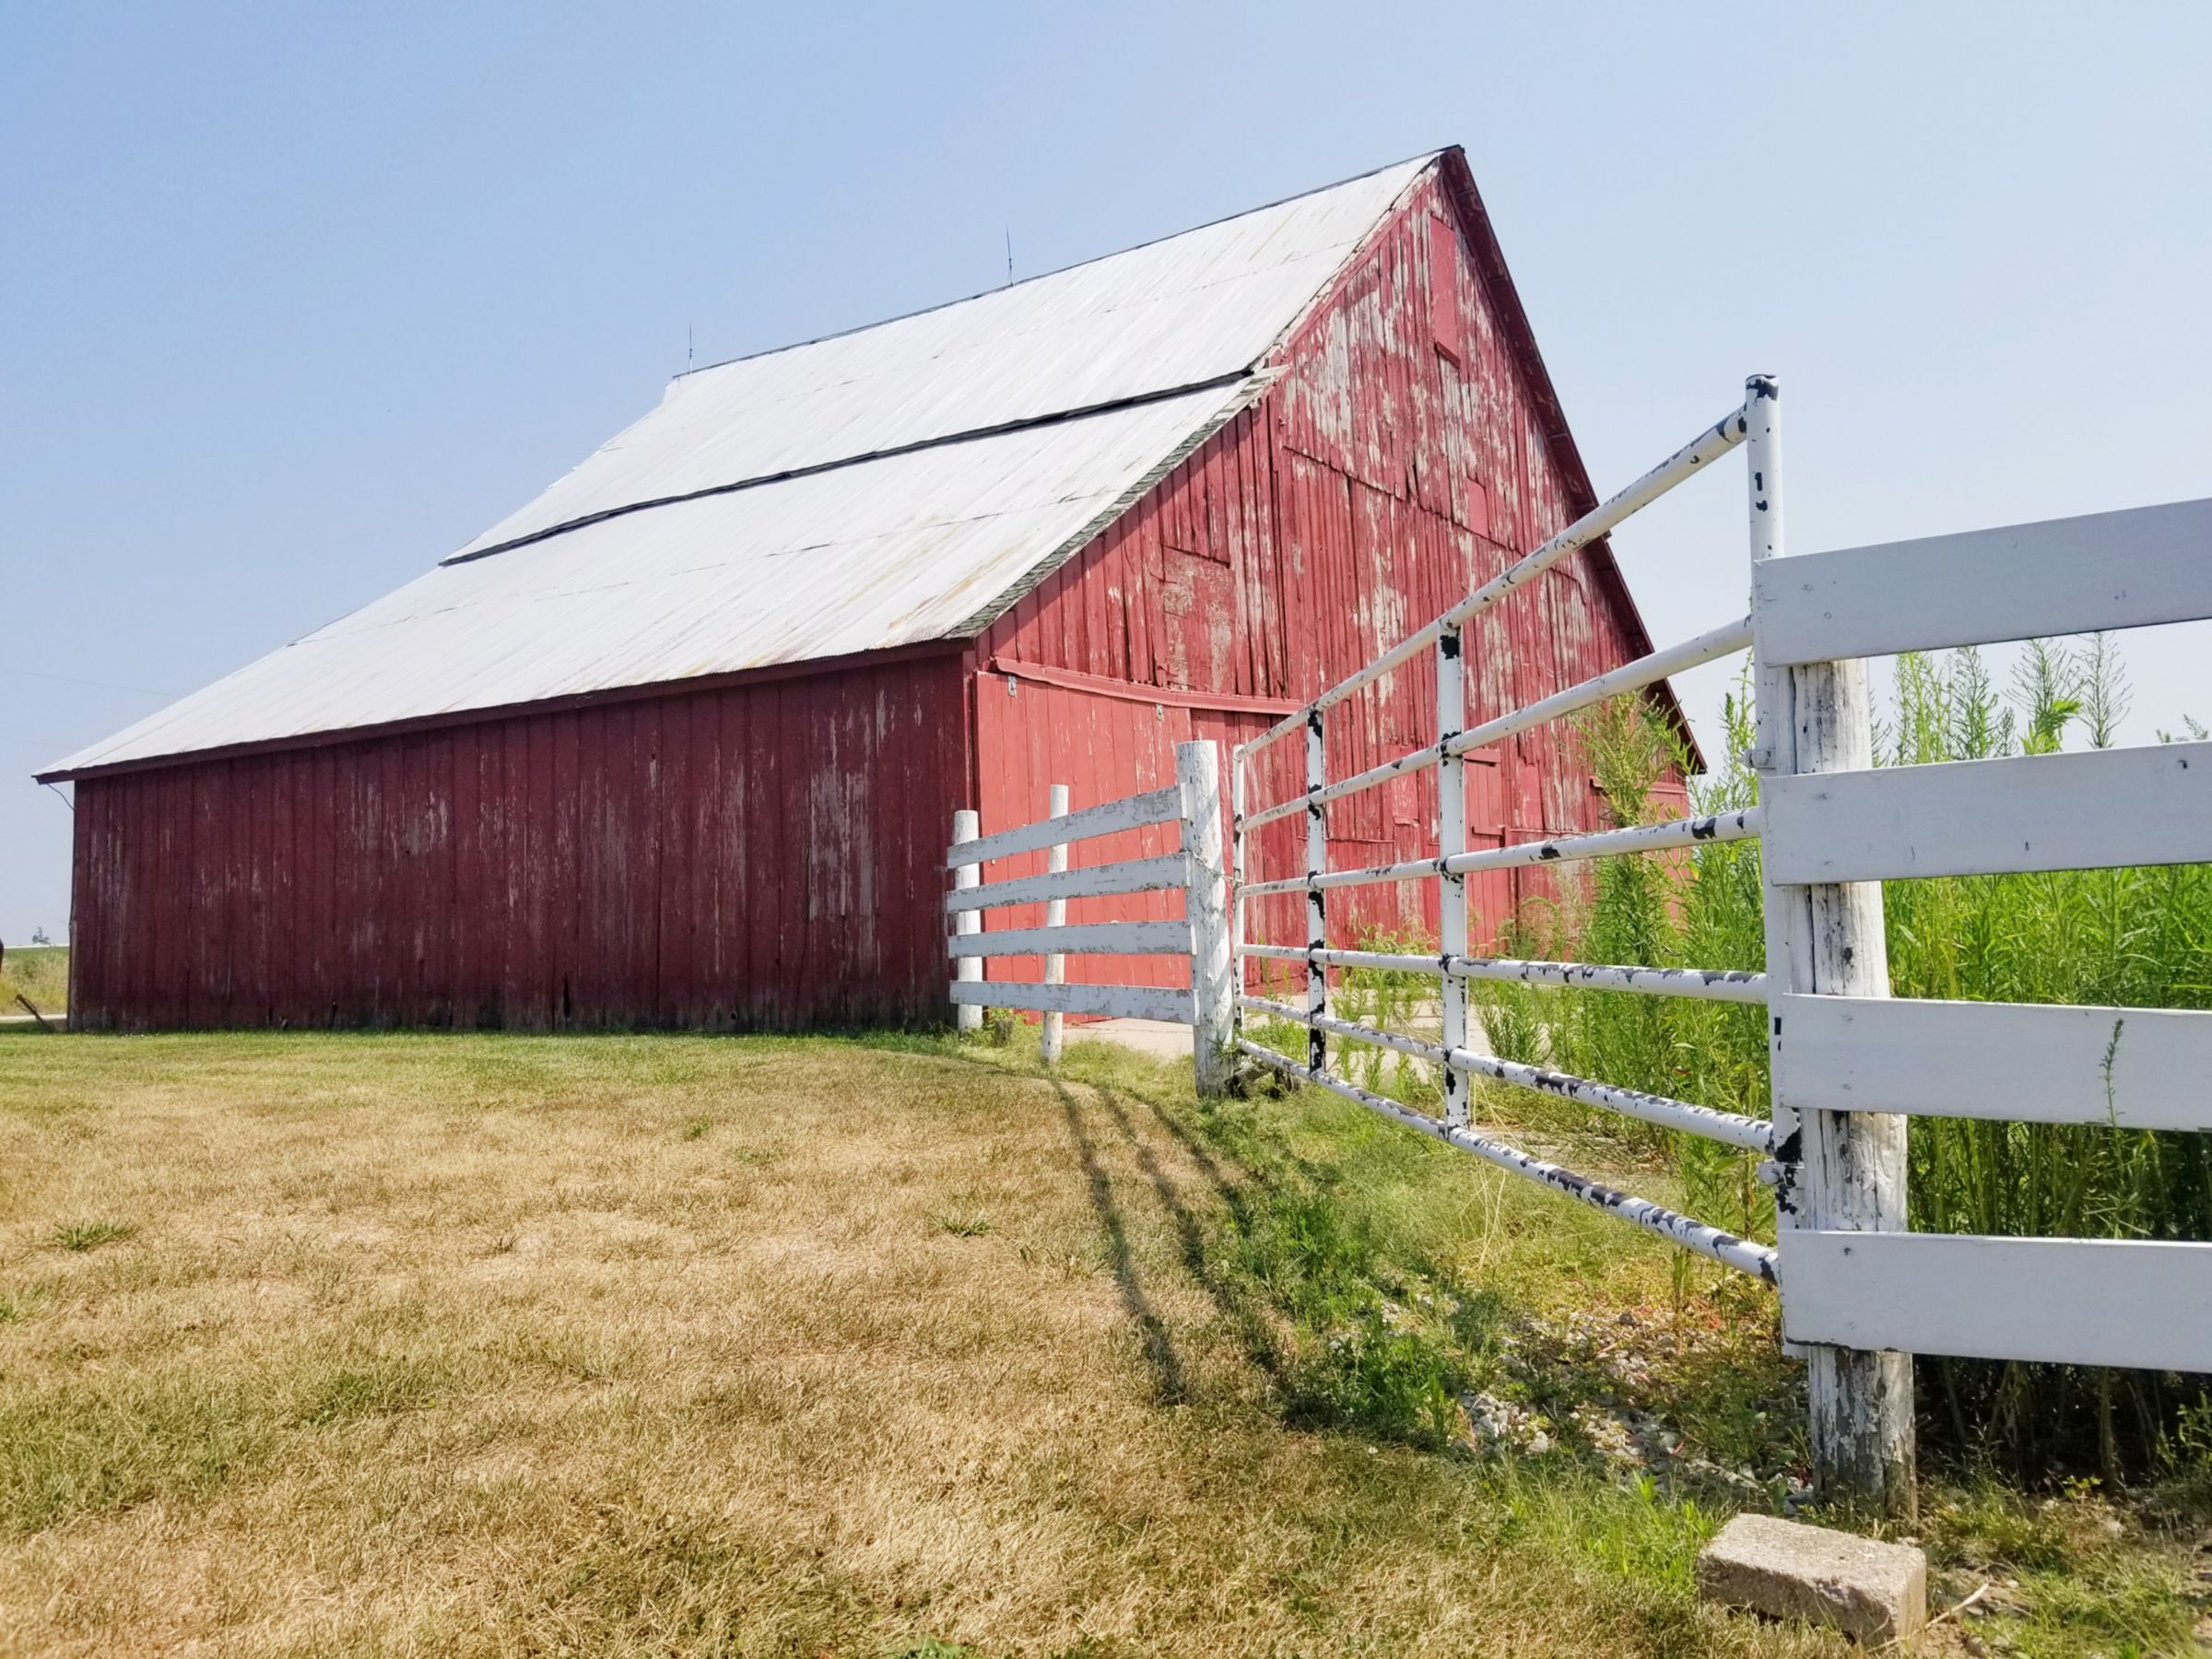 residential-land-poweshiek-county-iowa-5-acres-listing-number-15149-0-2020-08-28-200837.jpg